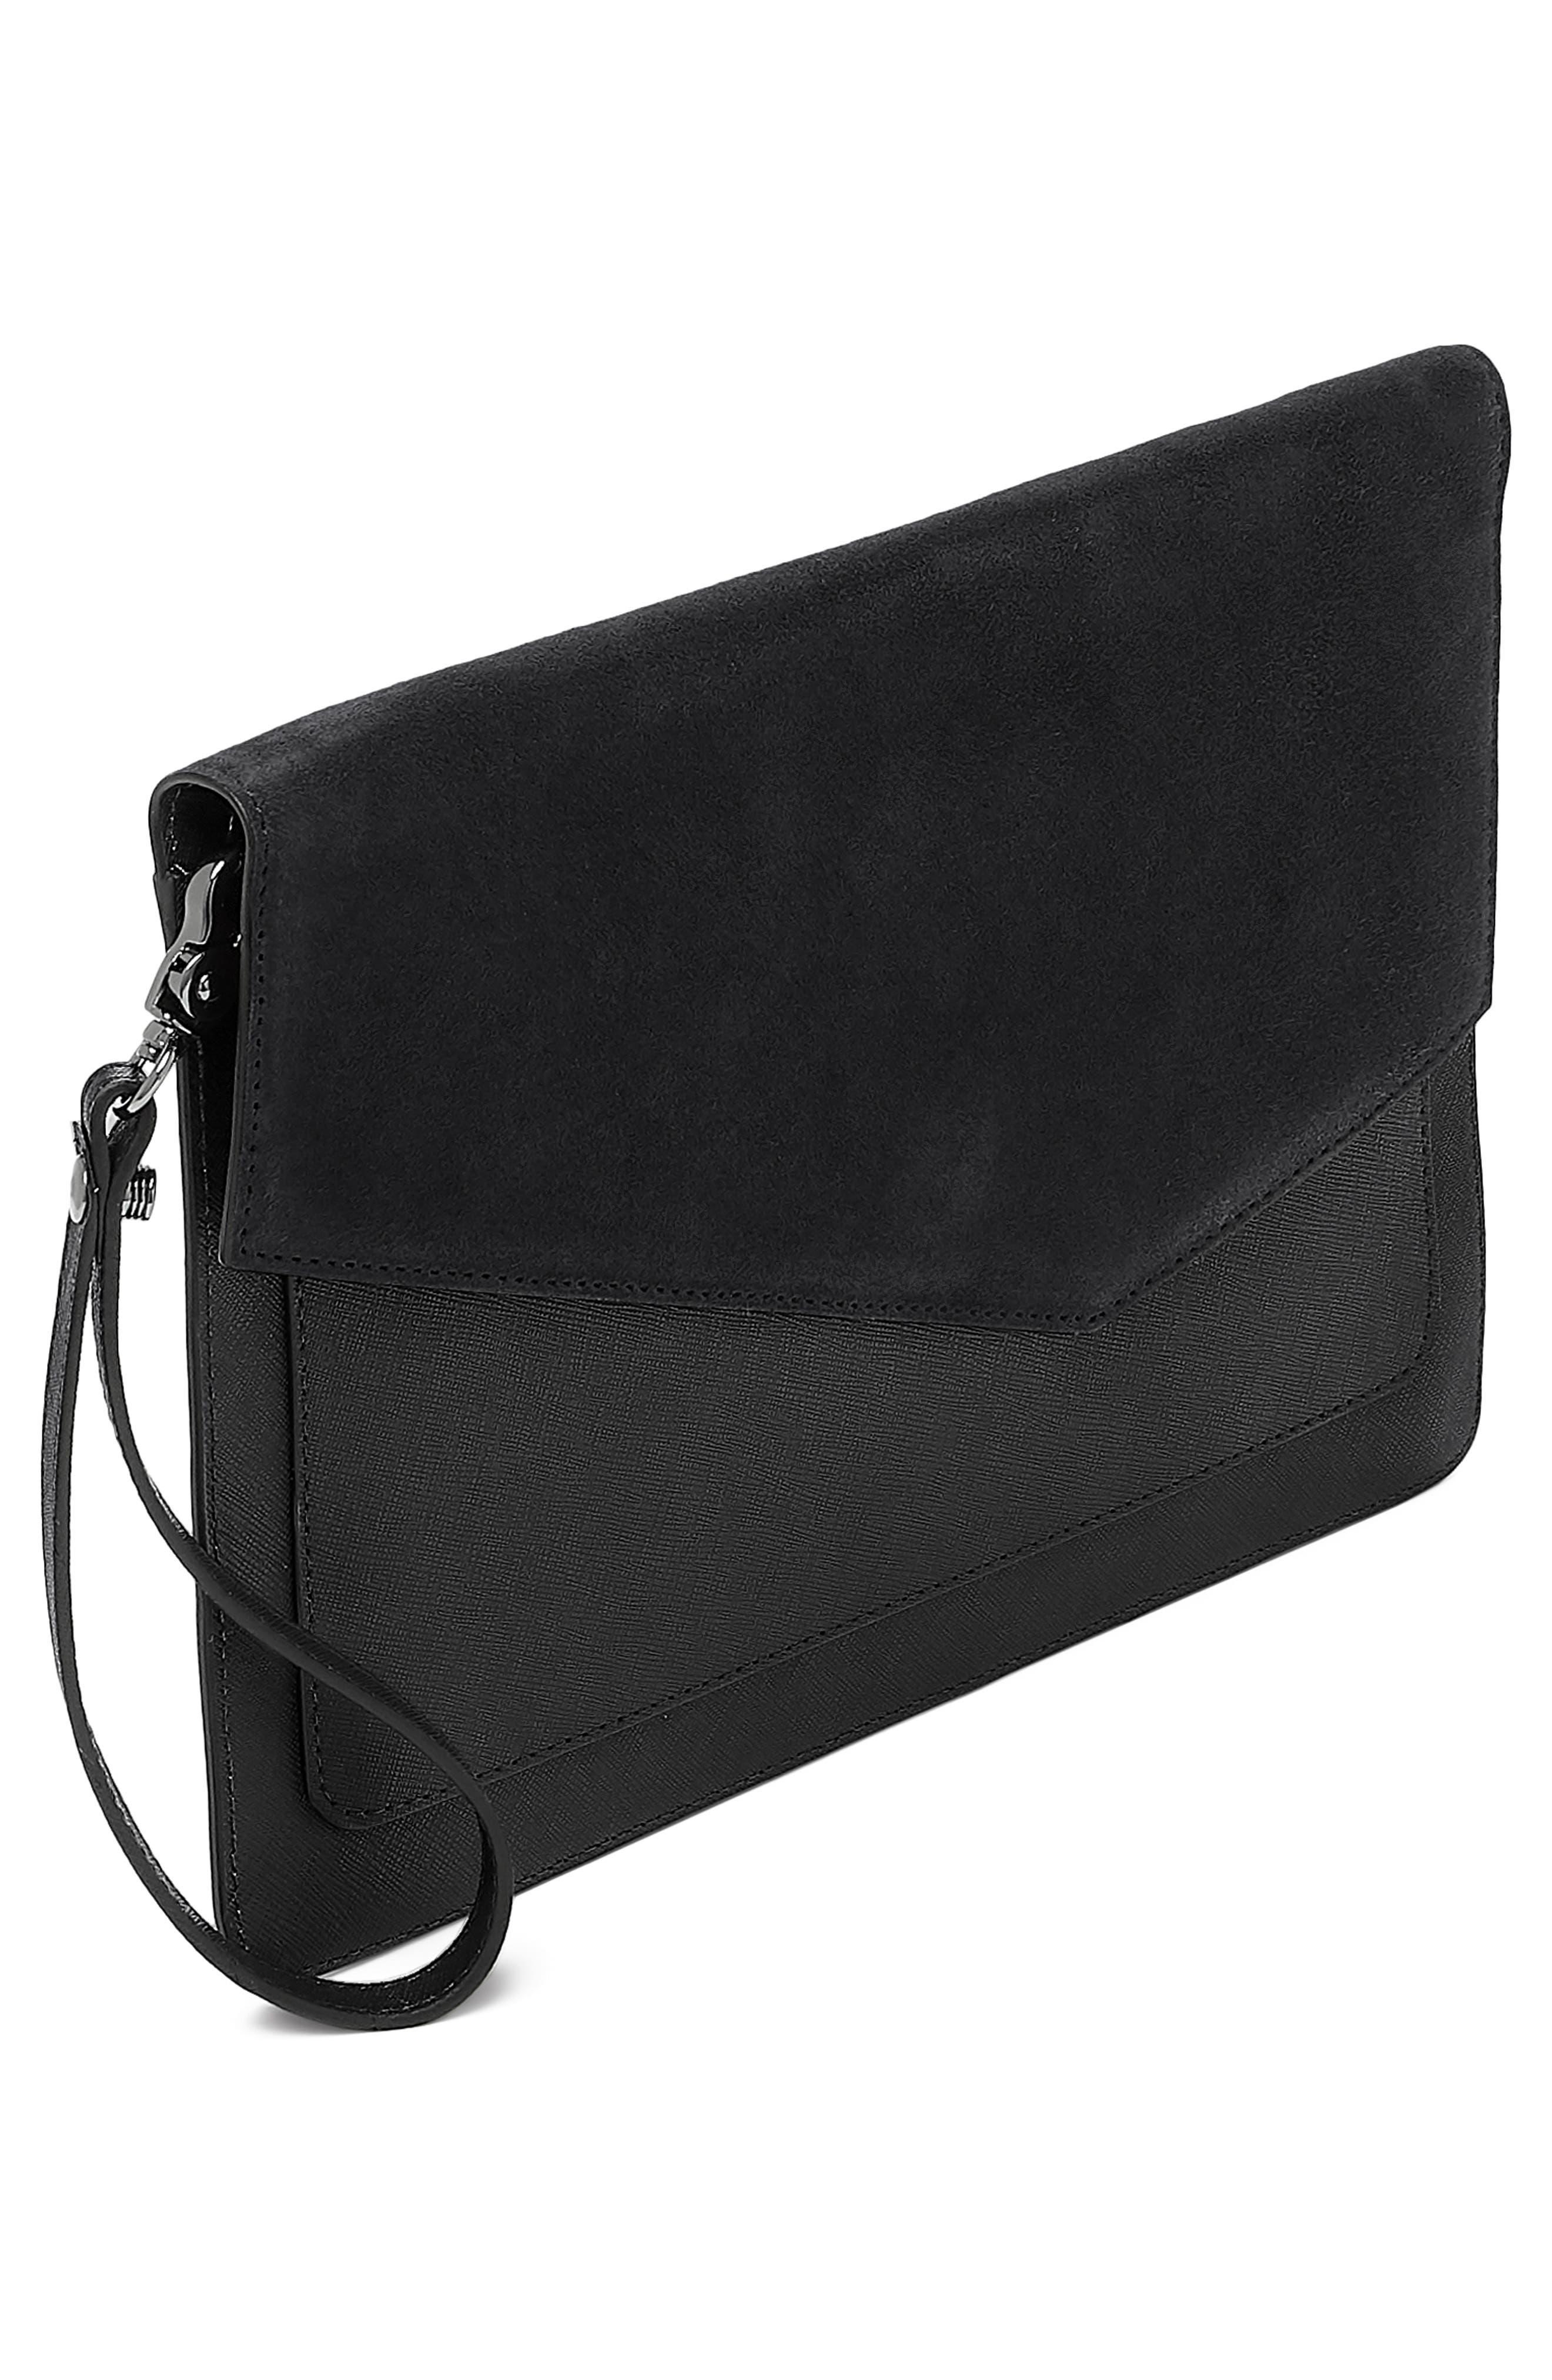 BOTKIER, Cobble Hill Calfskin Leather Flap Clutch, Alternate thumbnail 4, color, 001